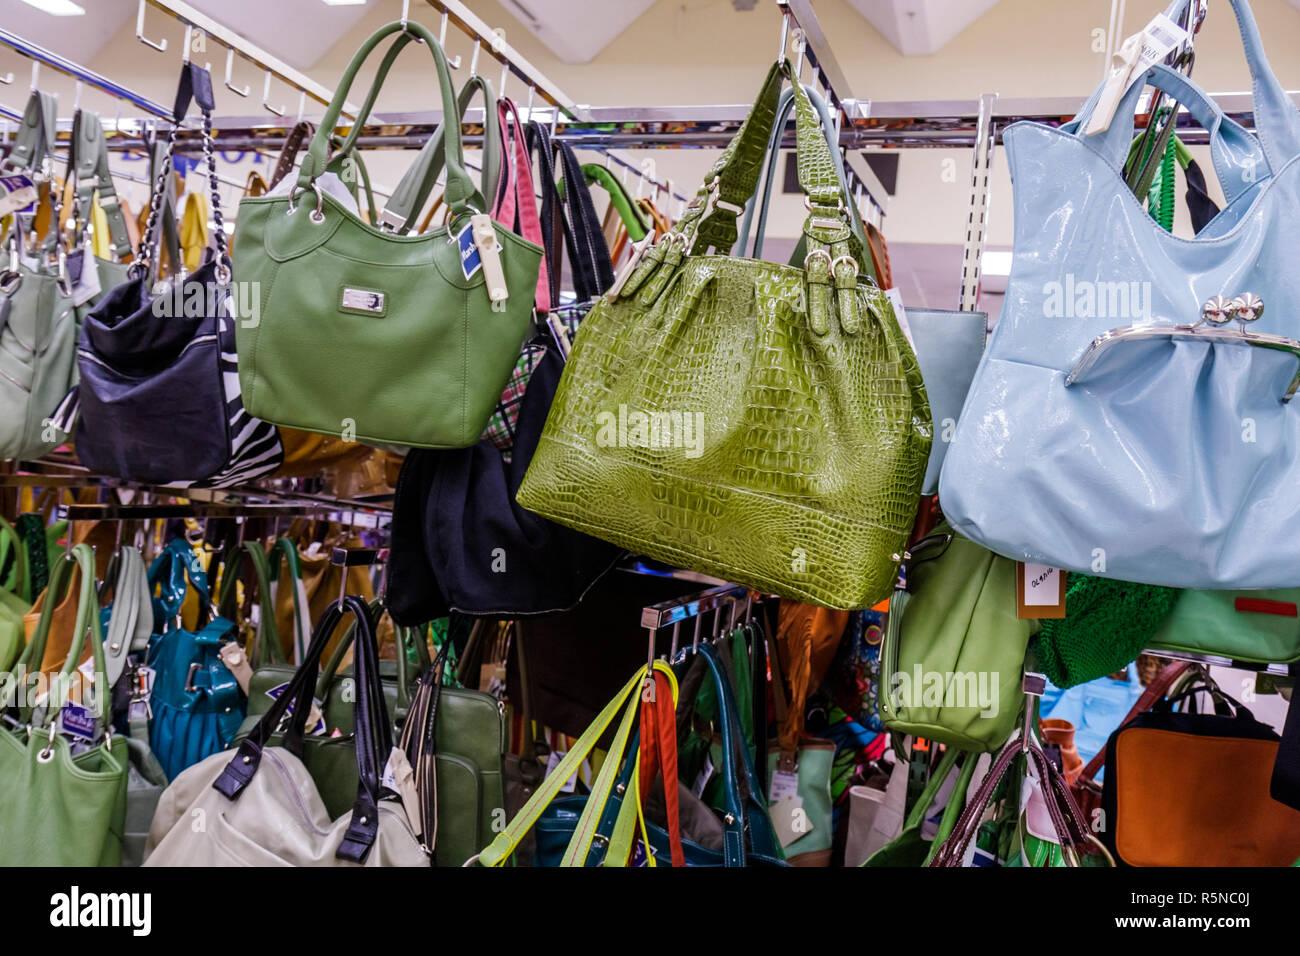 3640122b0131e9 Miami Florida Marshalls Department Store retail business discount  department store off-price retail handbags design fashion merc